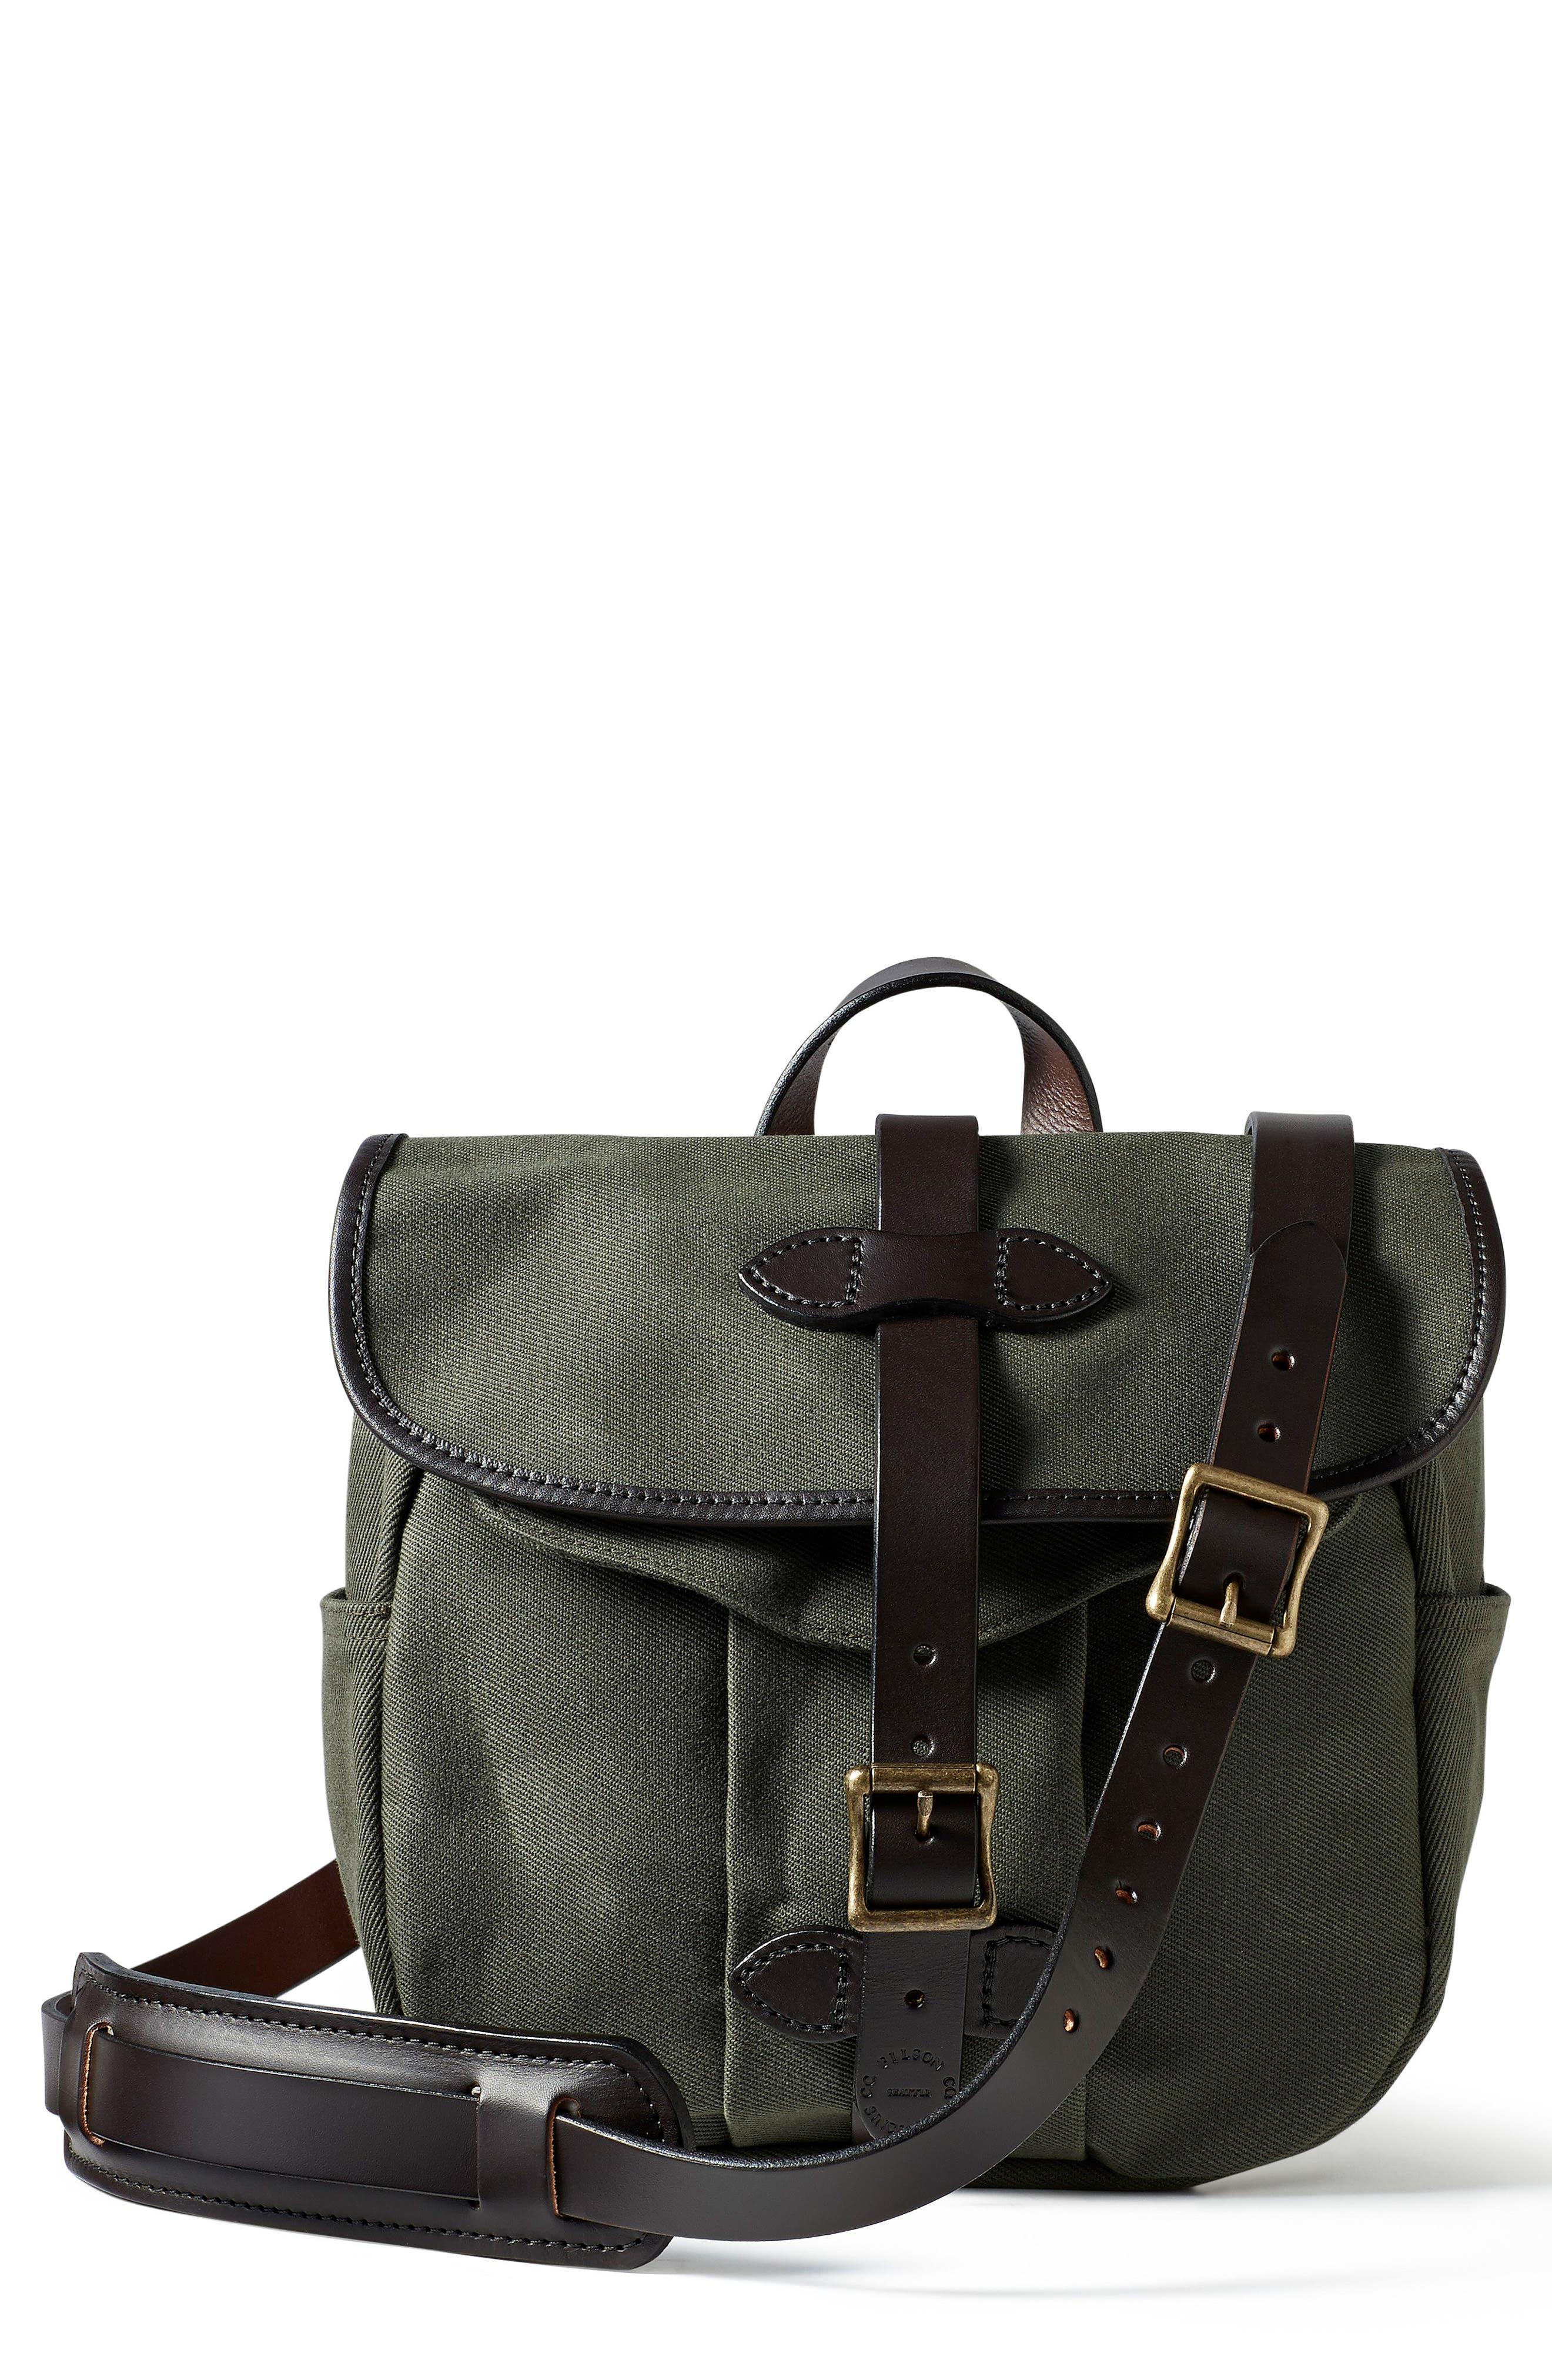 Small Field Bag,                             Main thumbnail 1, color,                             OTTER GREEN